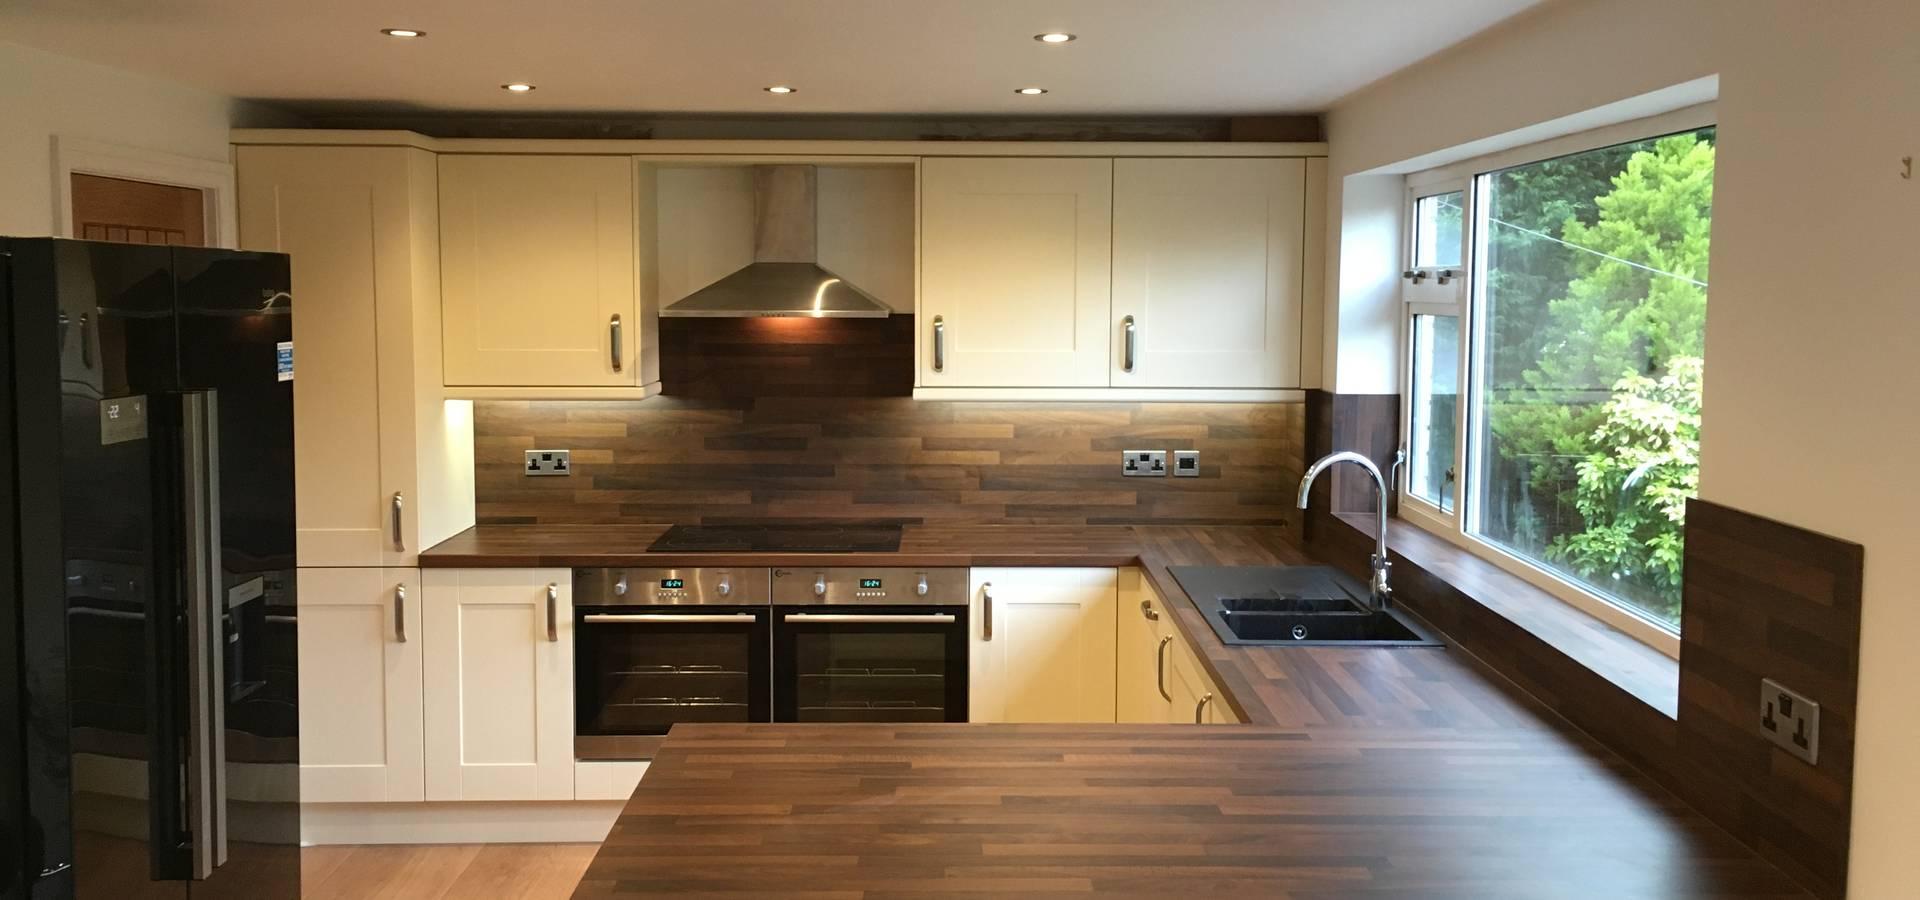 Design 4 living UK